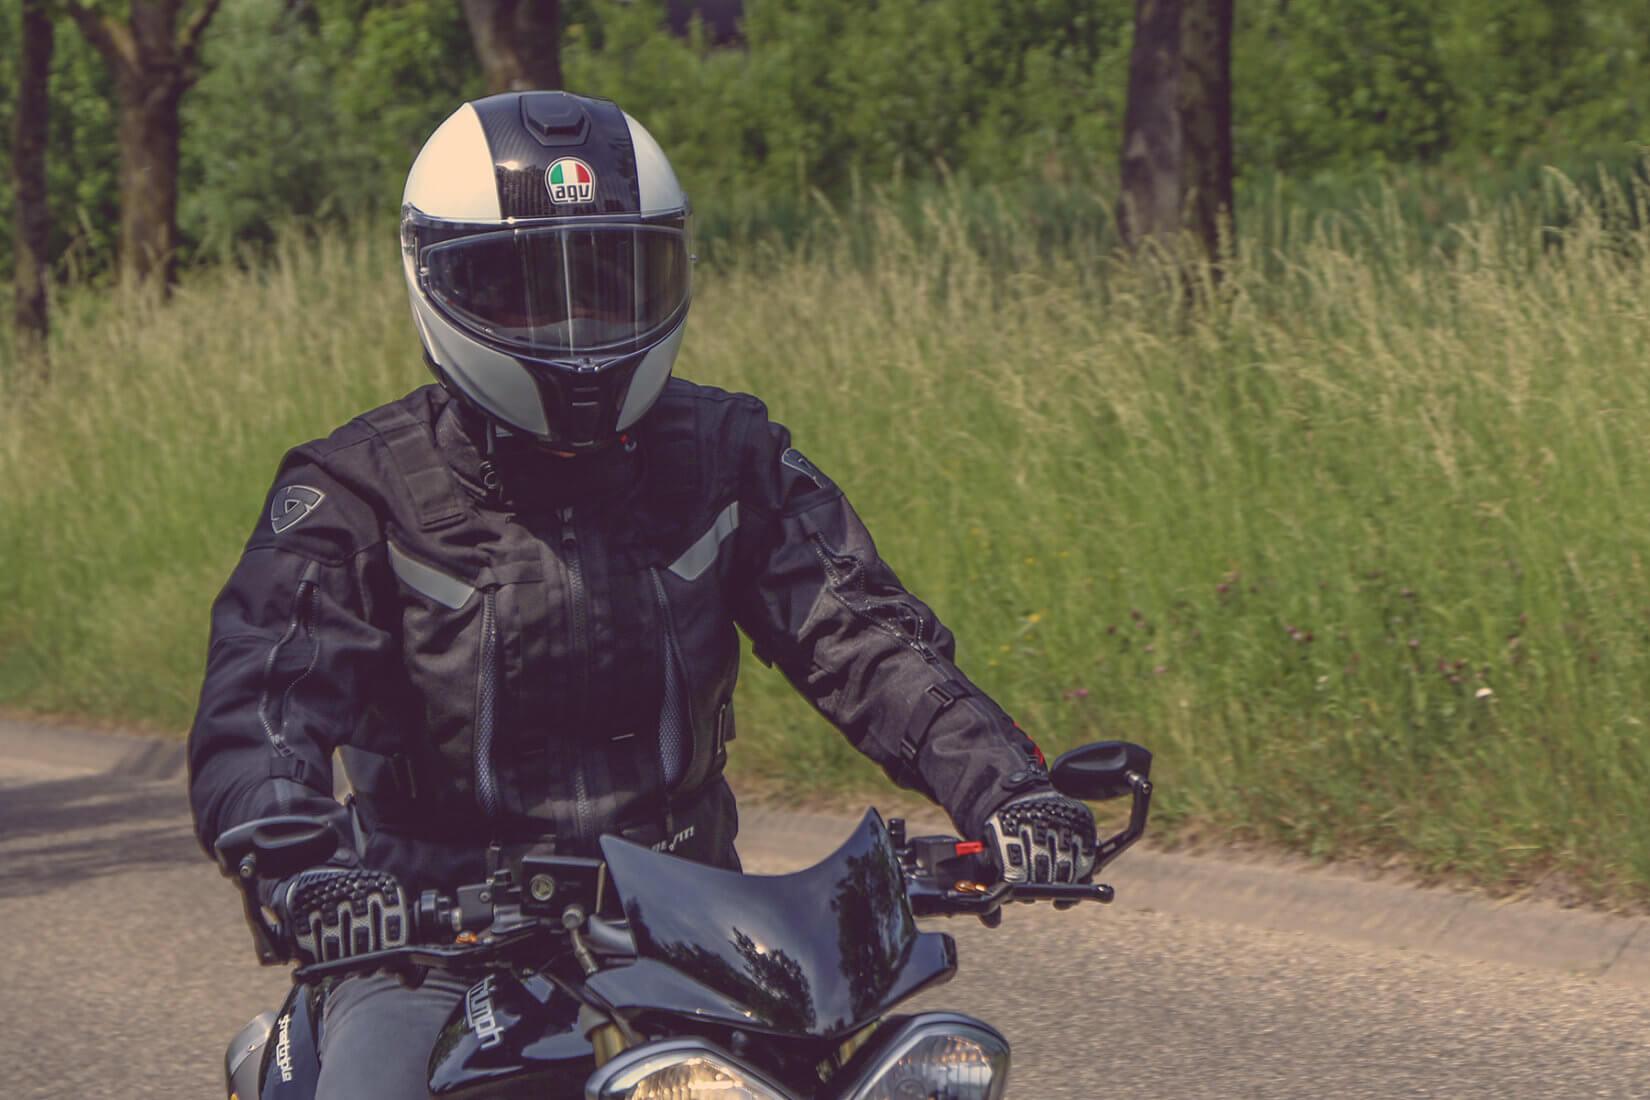 AGV Sportmodular stilste helm